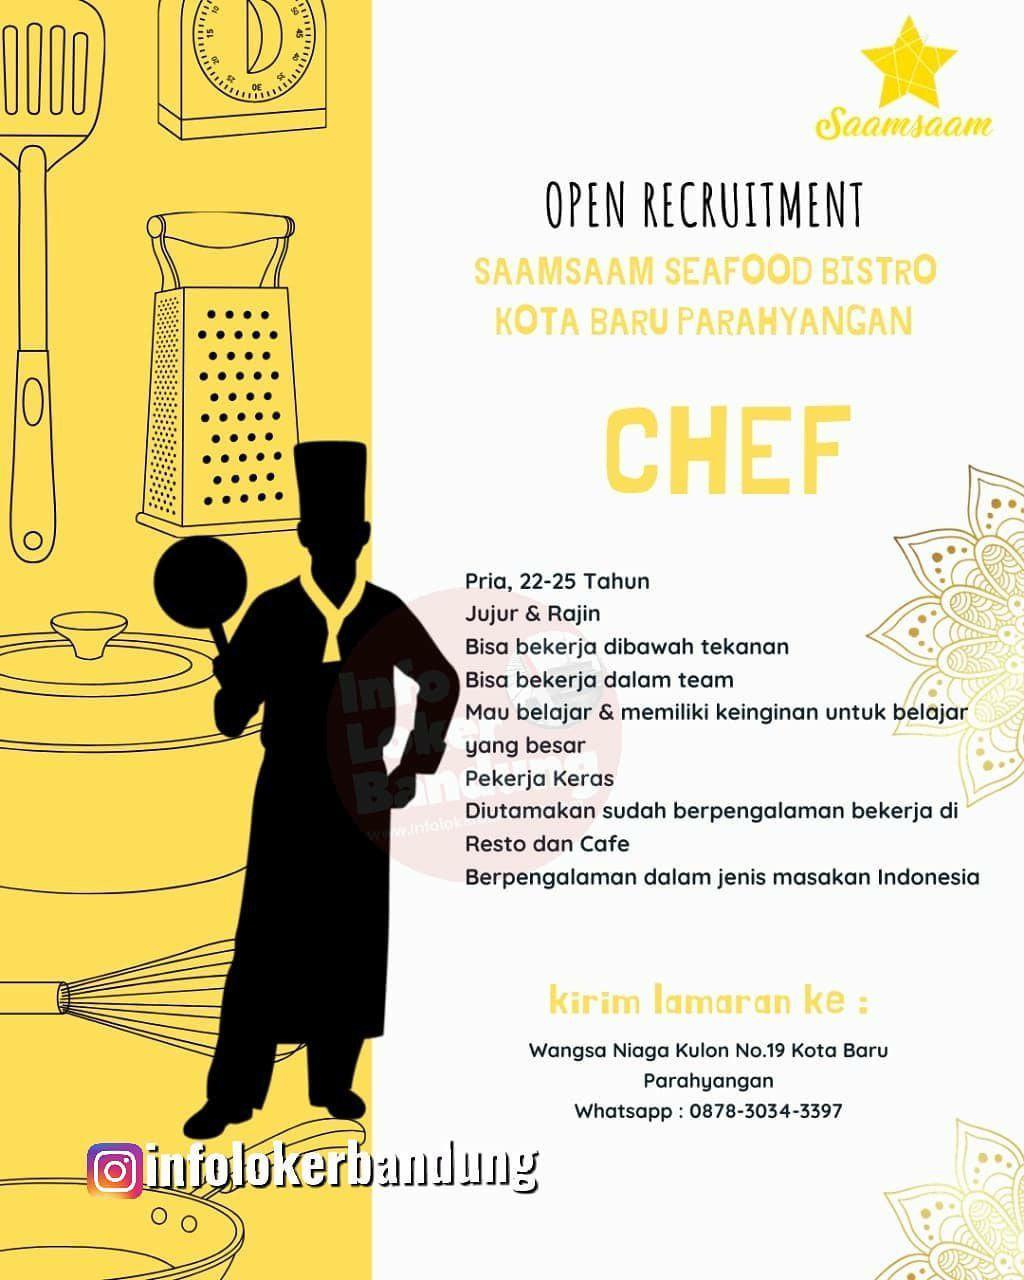 Lowongan Kerja Chef Saamsaam Sea Food Bistro Bandung Desember 2019